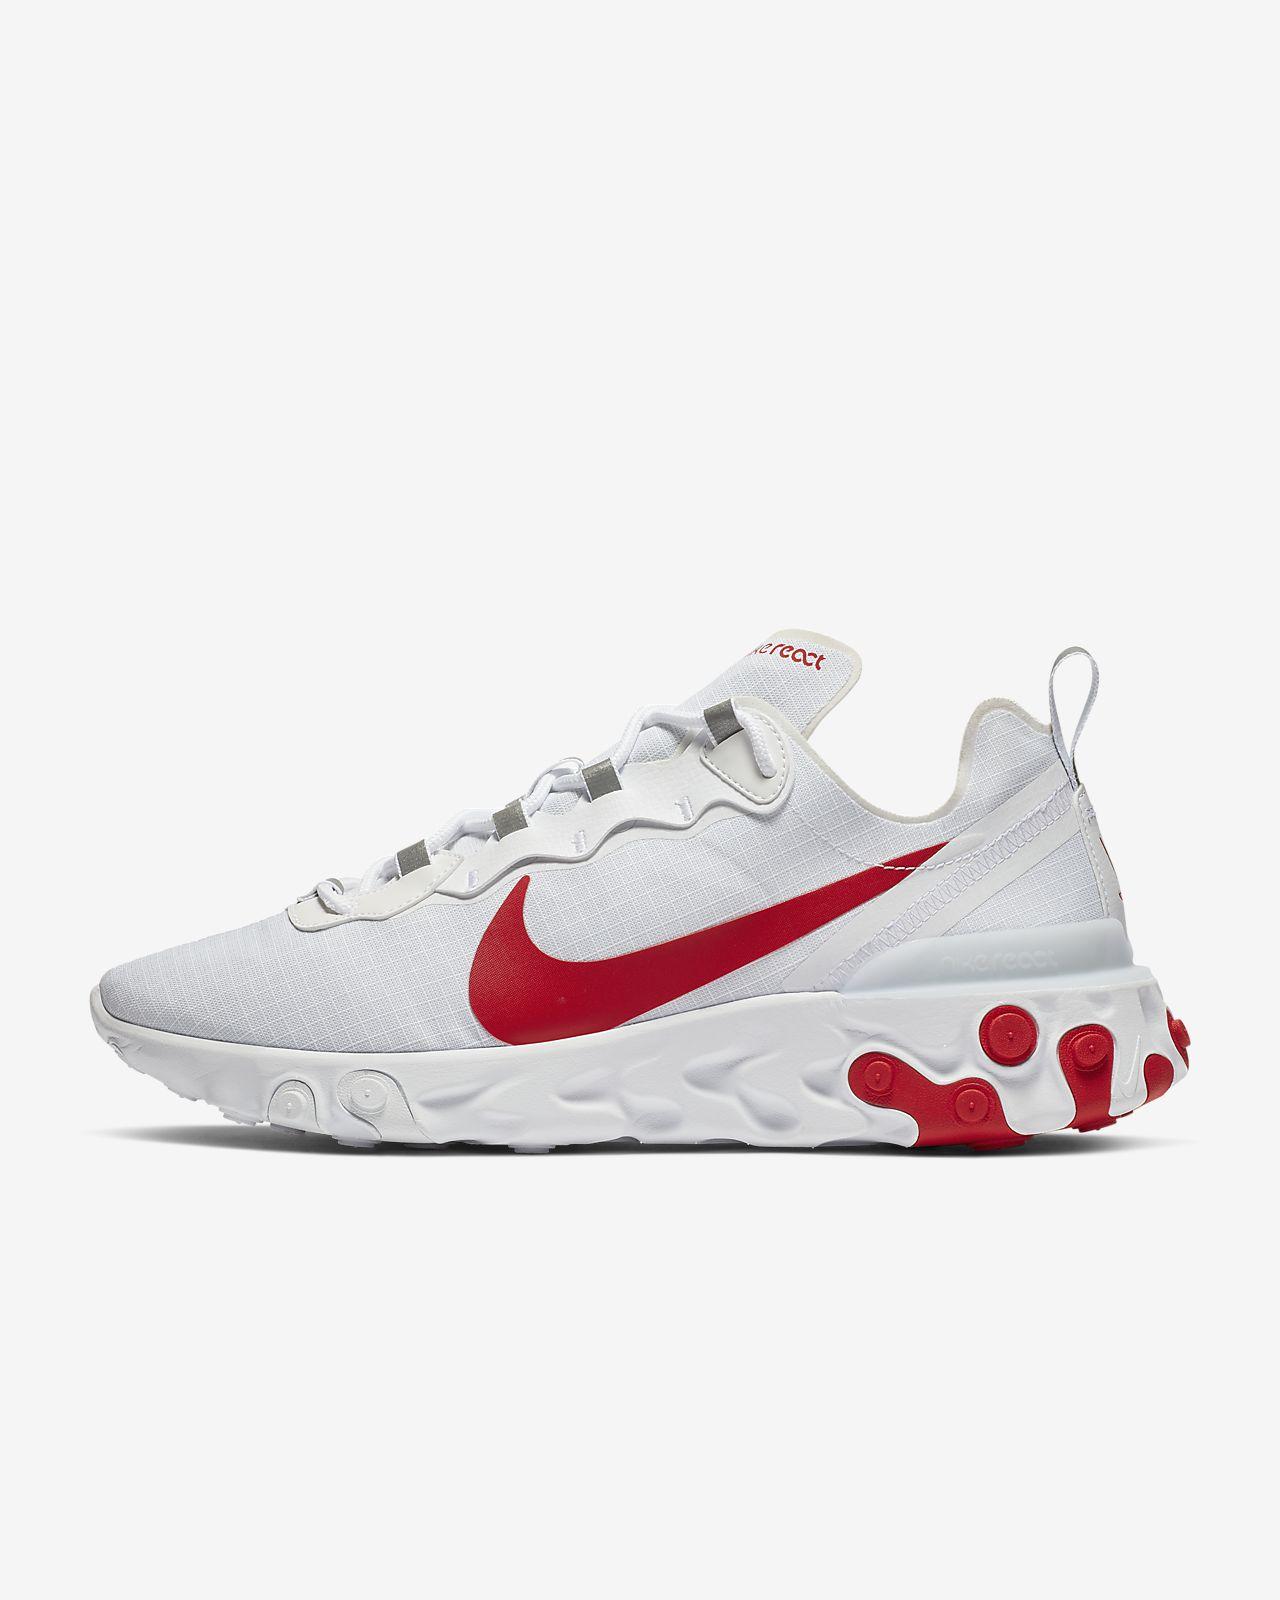 55 Nike 55 Herrenschuh React Nike React Herrenschuh React 55 SE SE Nike qSzVpGMU